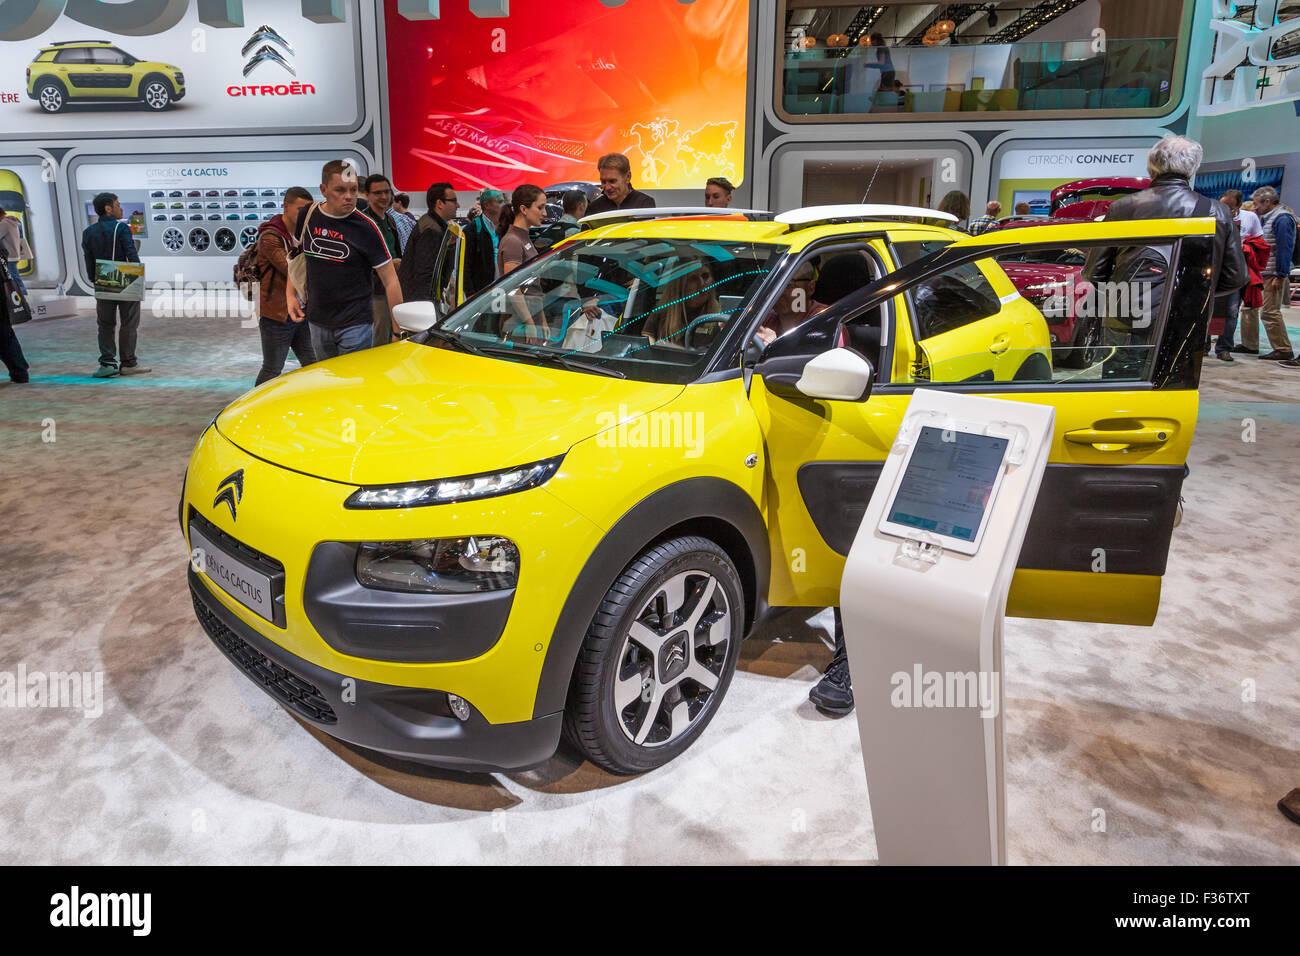 Citroen C4 Cactus Crossover at the IAA International Motor Show 2015 - Stock Image